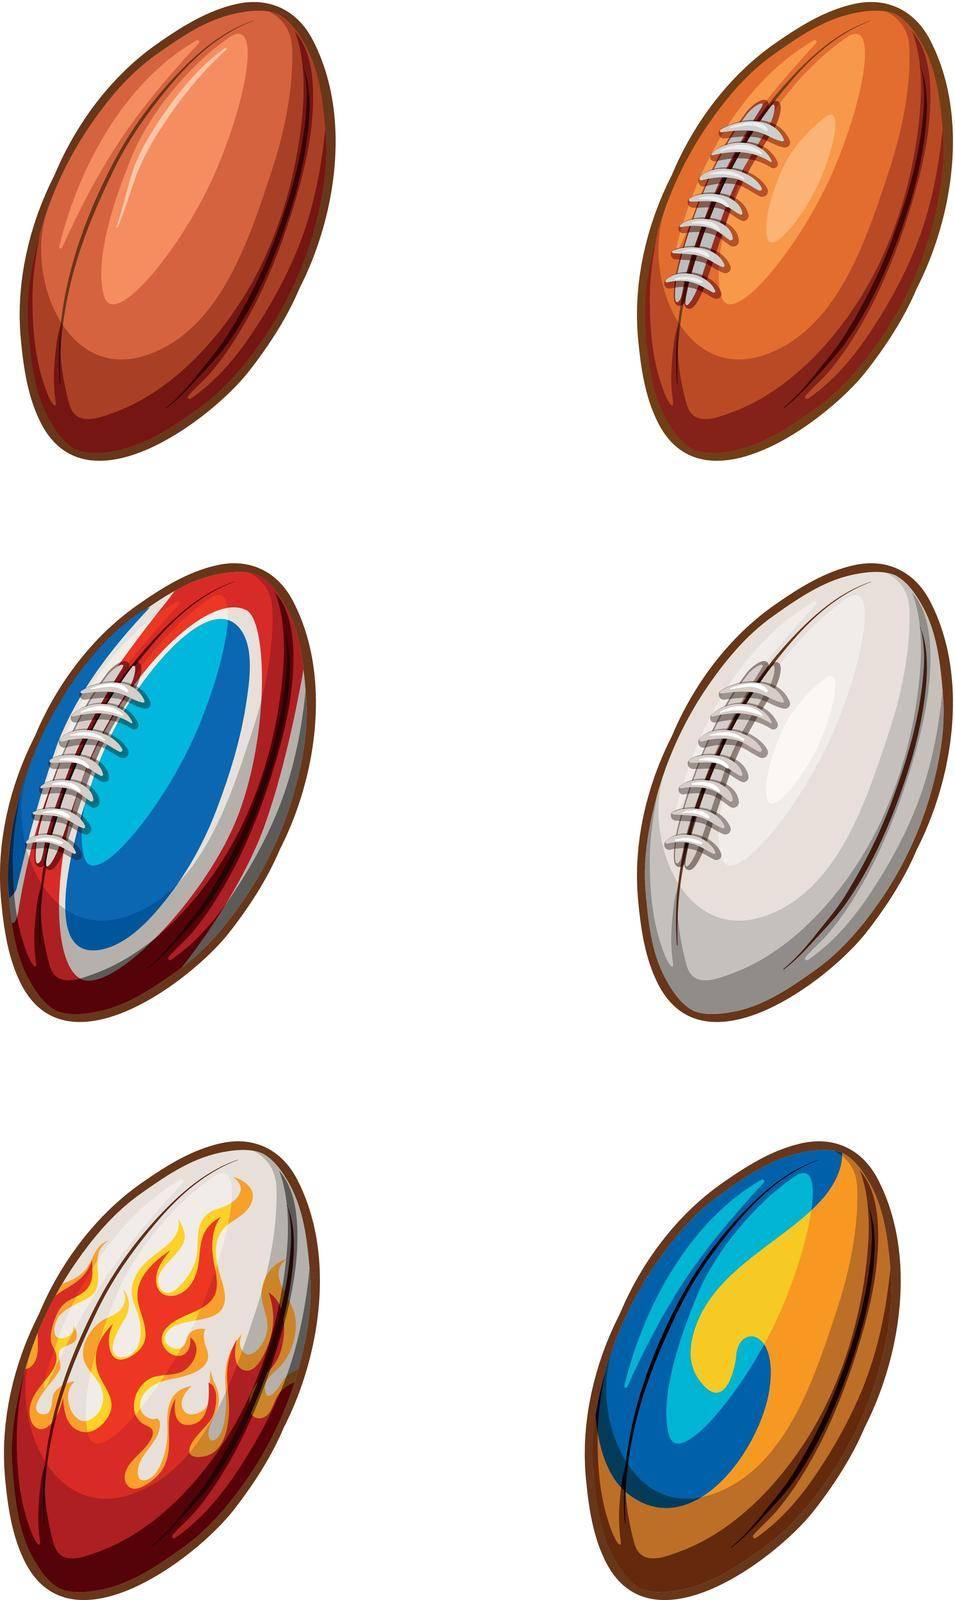 Illustration of different design of football